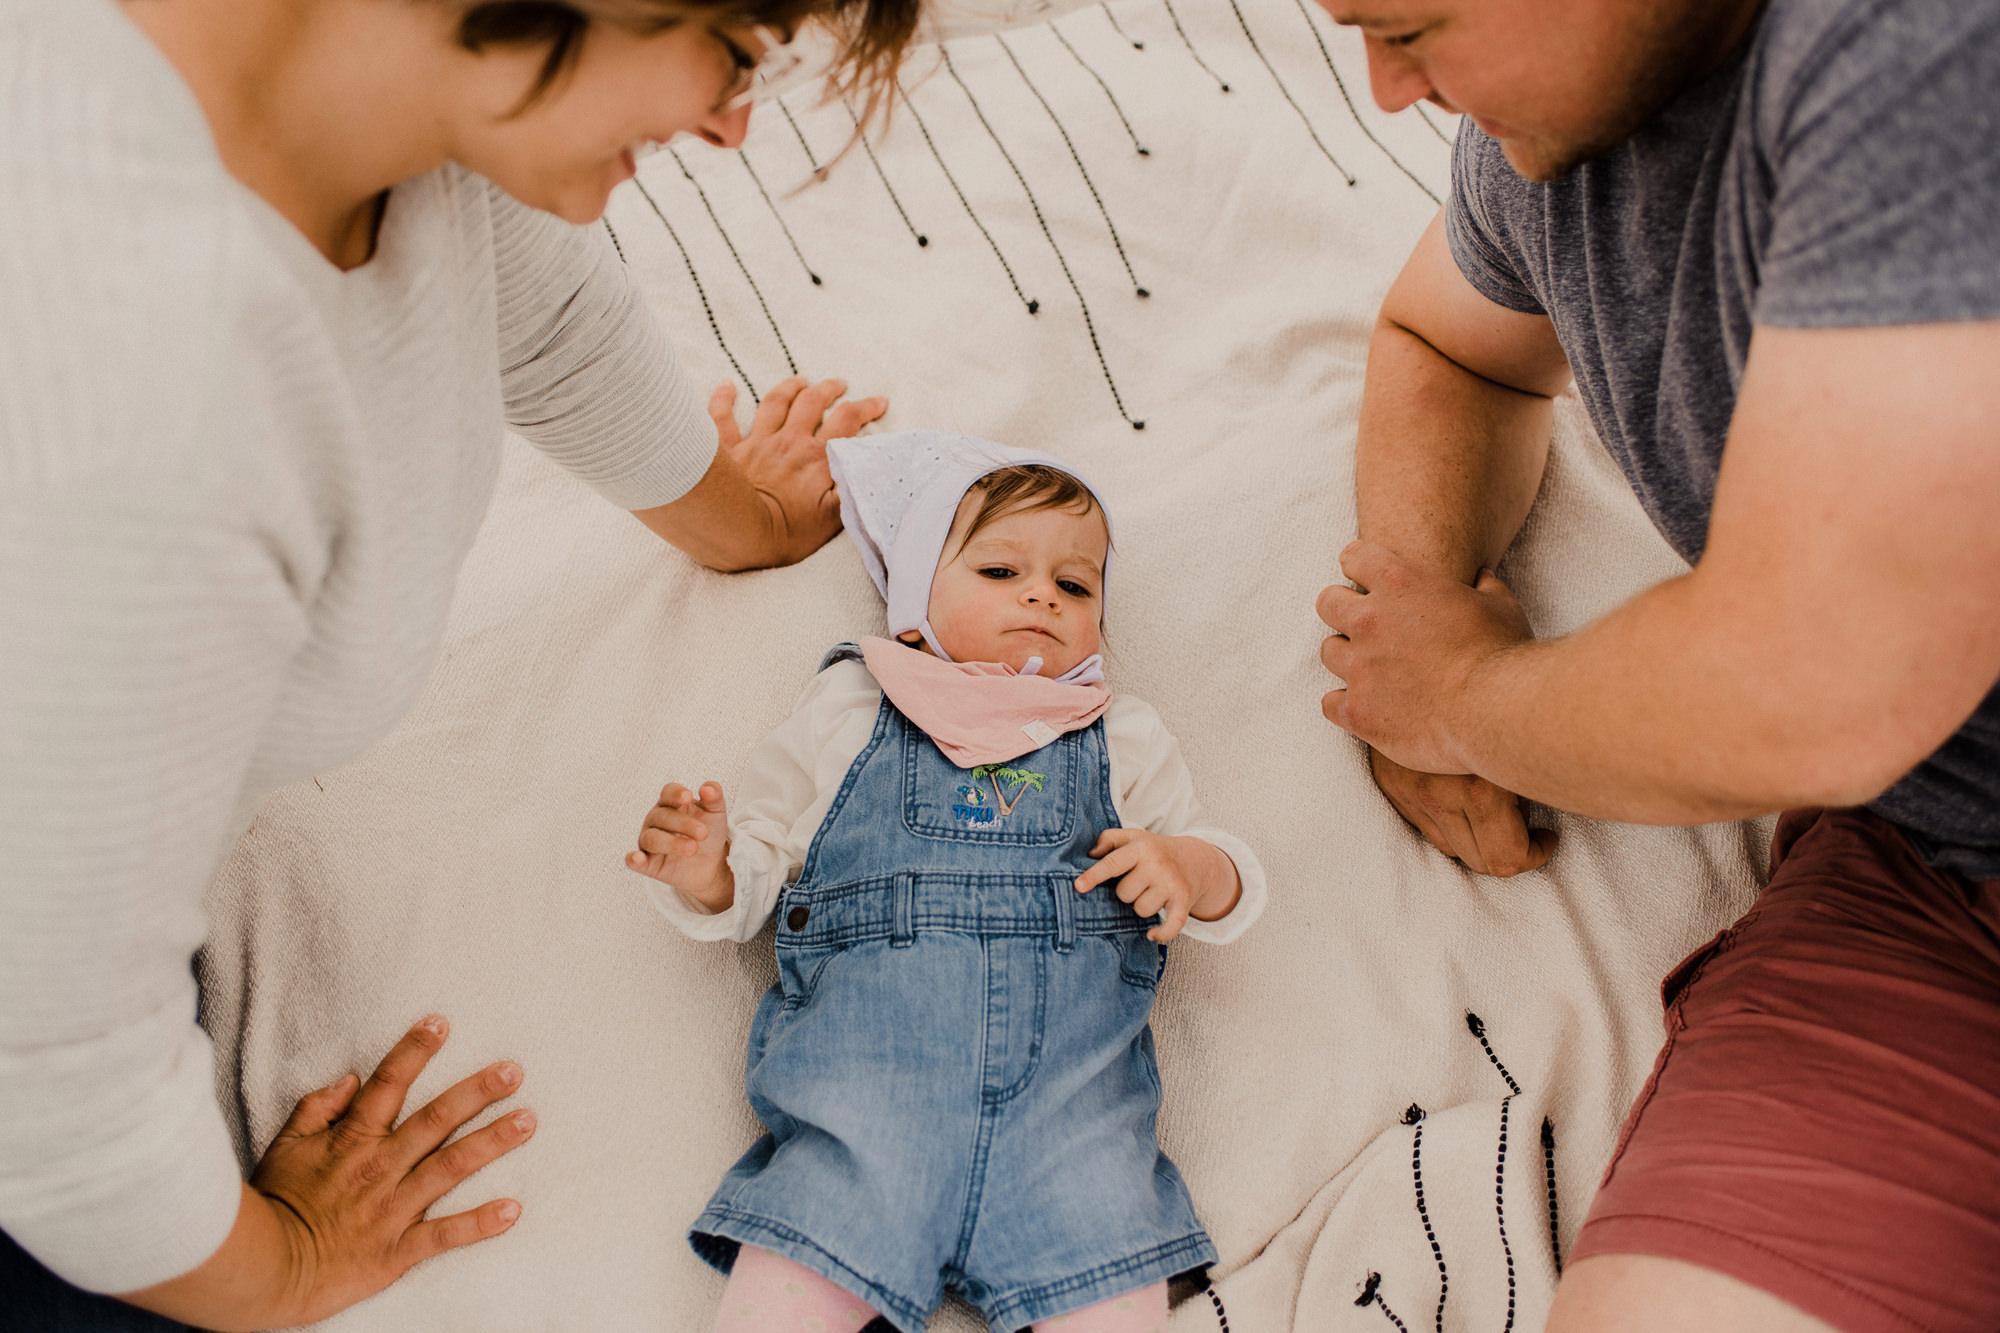 Familienshooting - Zingst - Familienfotograf - Darß - Fotoshooting Ostsee - Graal Müritz - Prerow - Wustrow - Fotograf Warnemünde